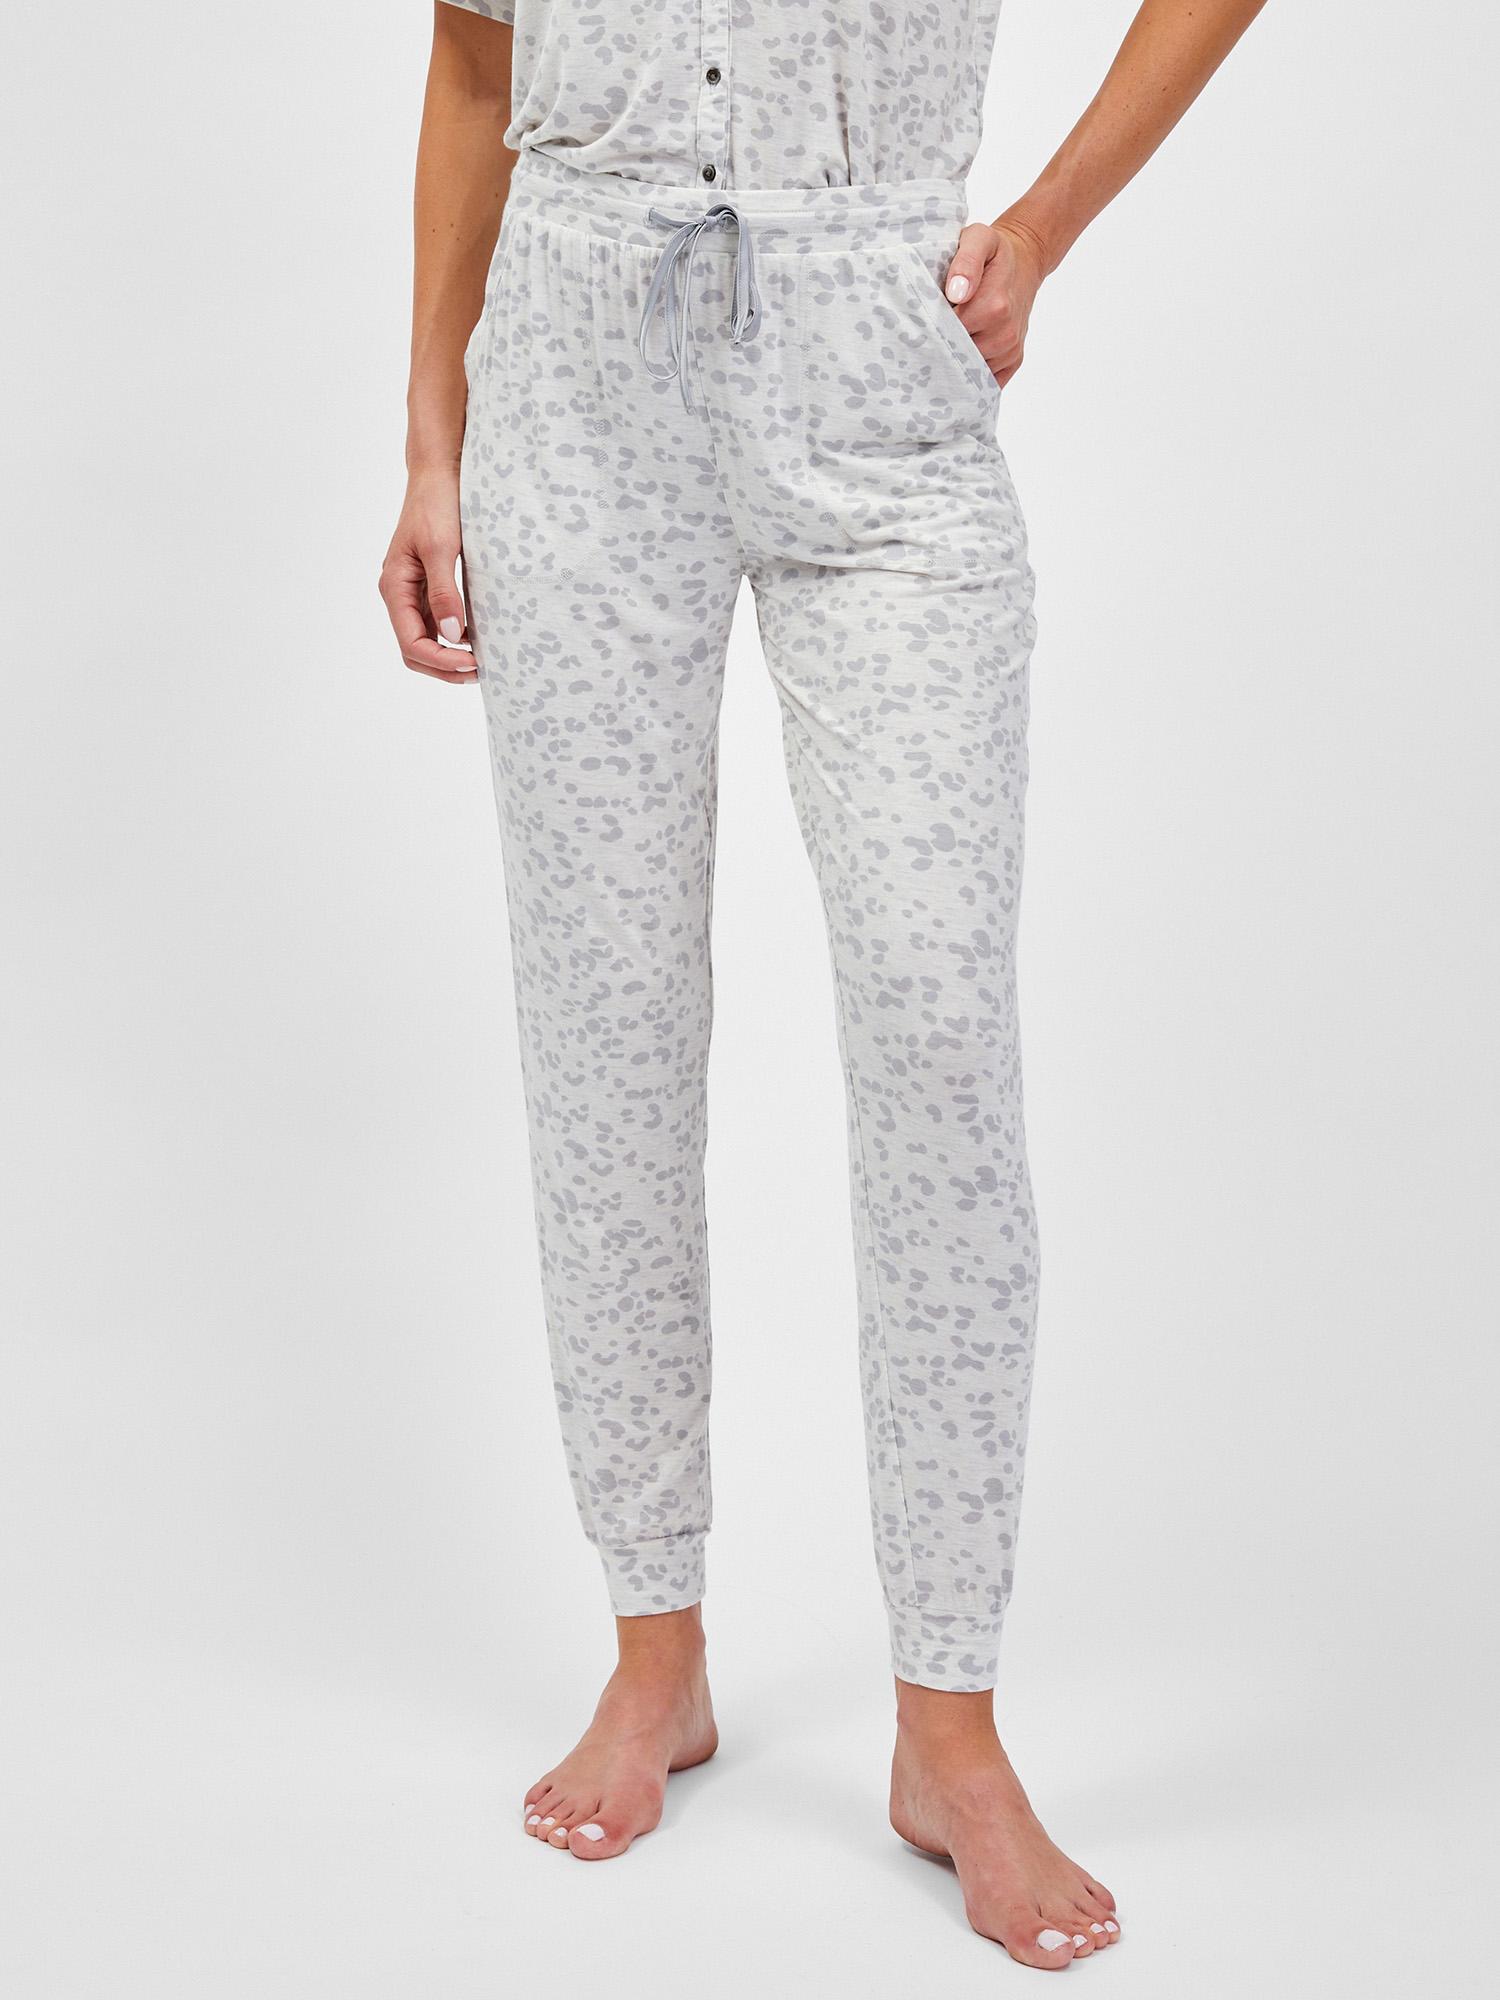 GAP bílé dámské pyžamové kalhoty - XL